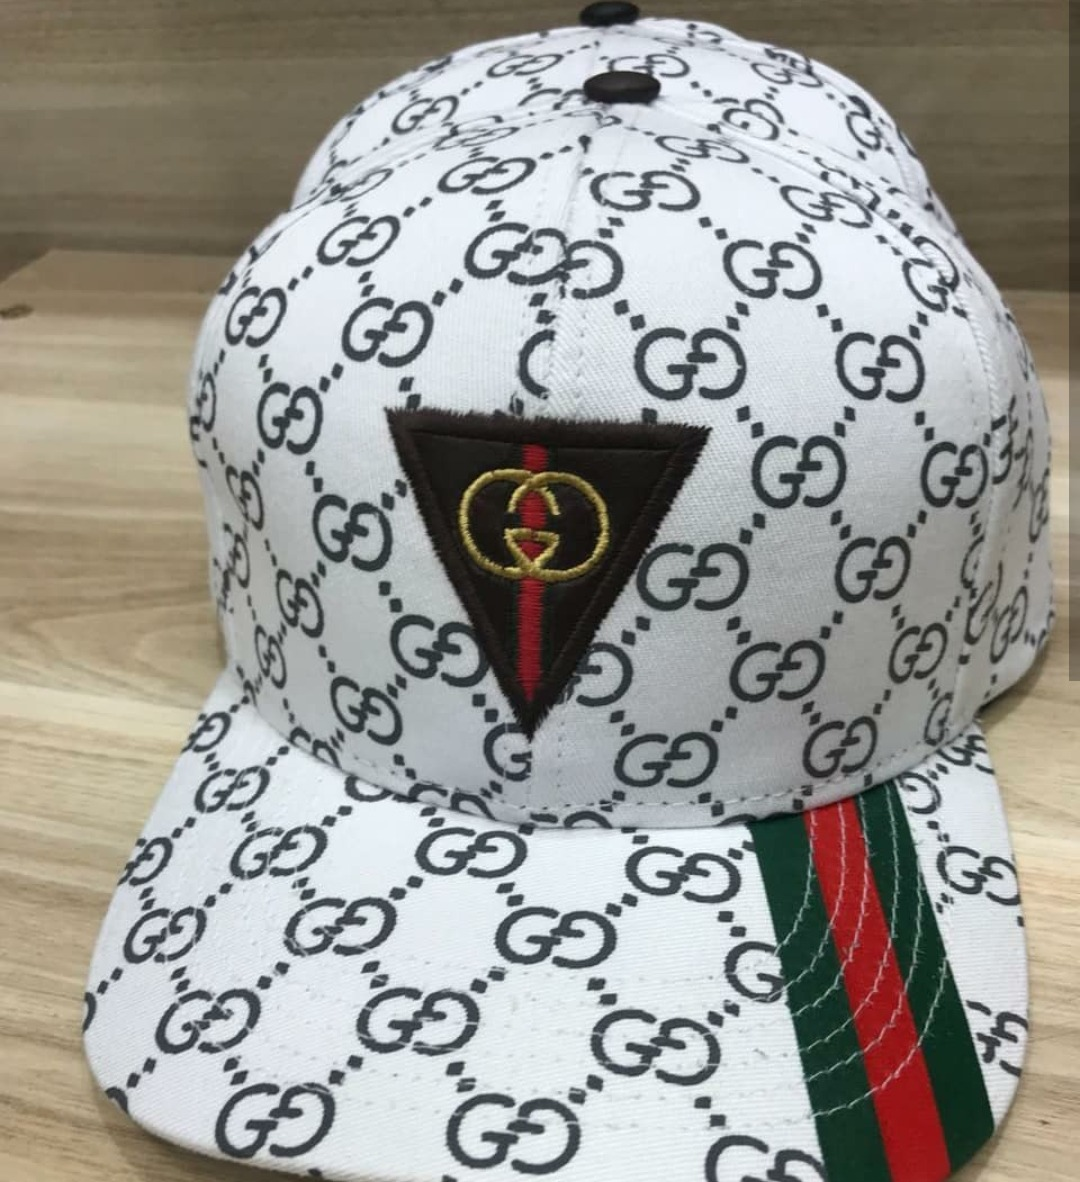 ebe41f414f699 Kit 10 Bonés Da Marca Gucci Atacado Para Revenda